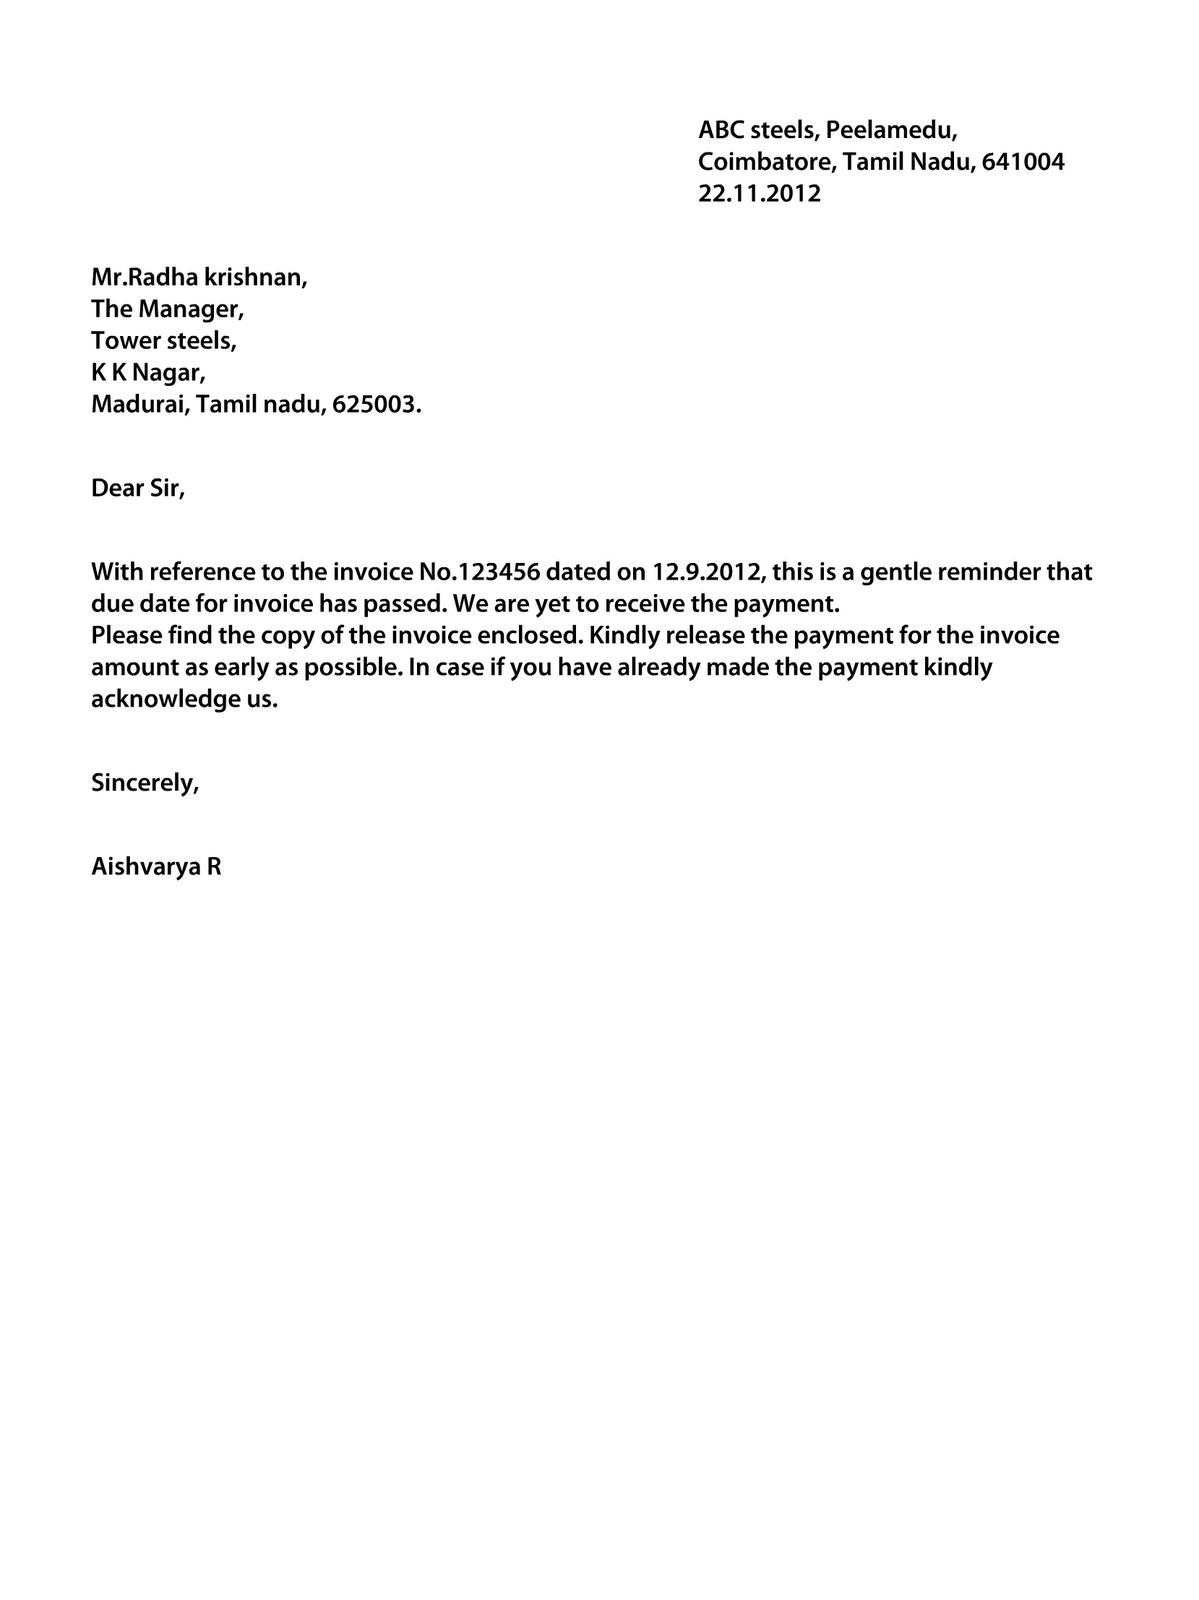 Dollar Price: Letter regarding outstanding payment